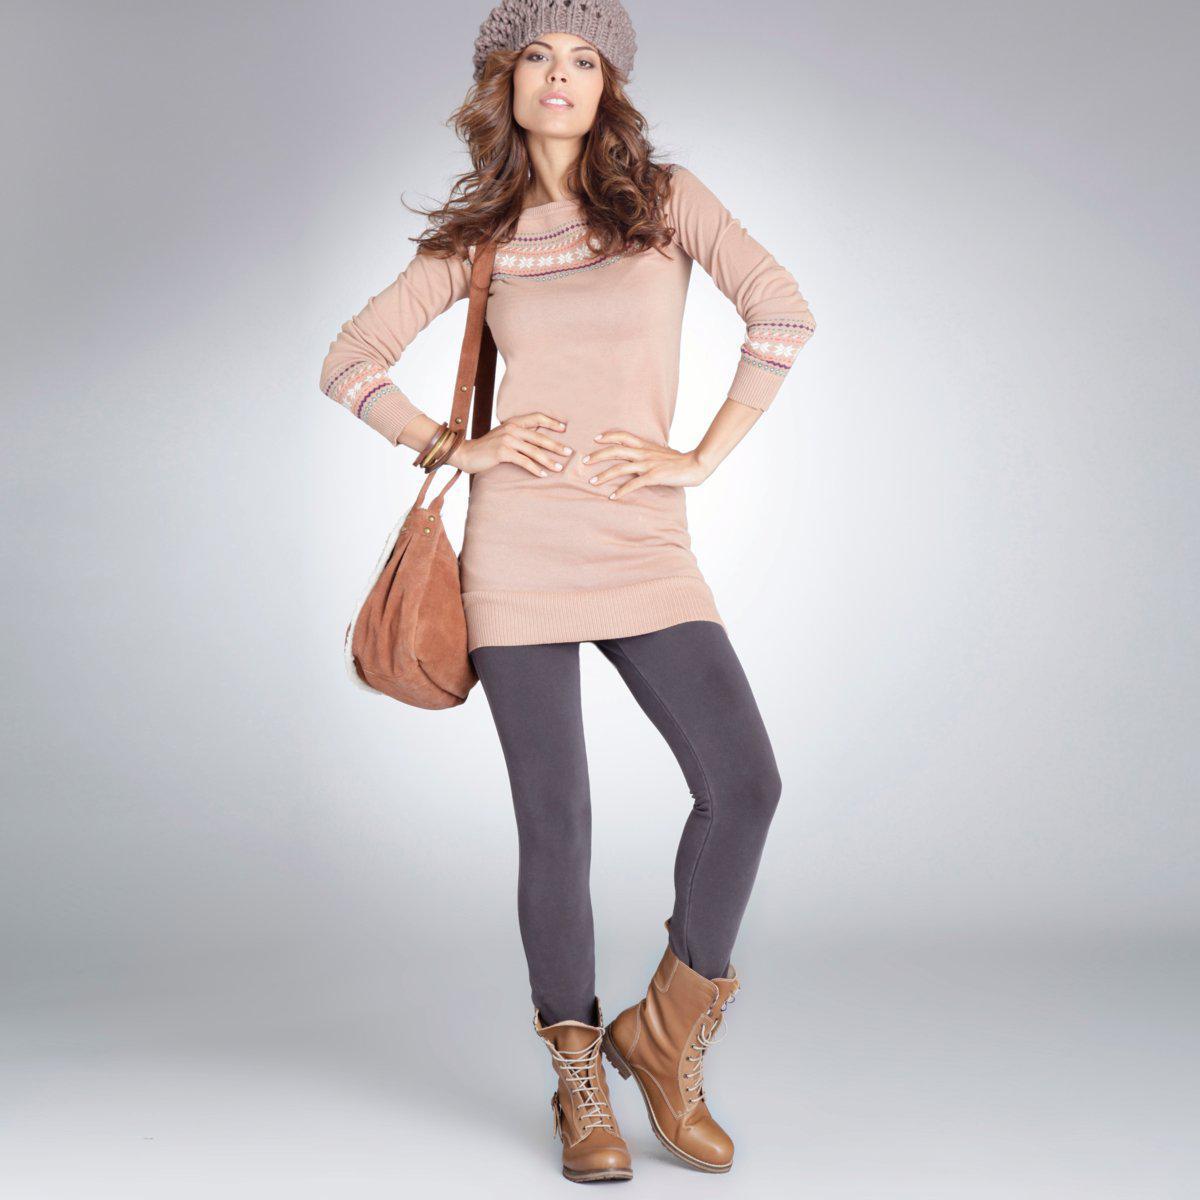 bradyna foremata 241 - Βραδυνα Φορεματα LaRedoute Φθινόπωρο 2011 Κωδ. 324215109